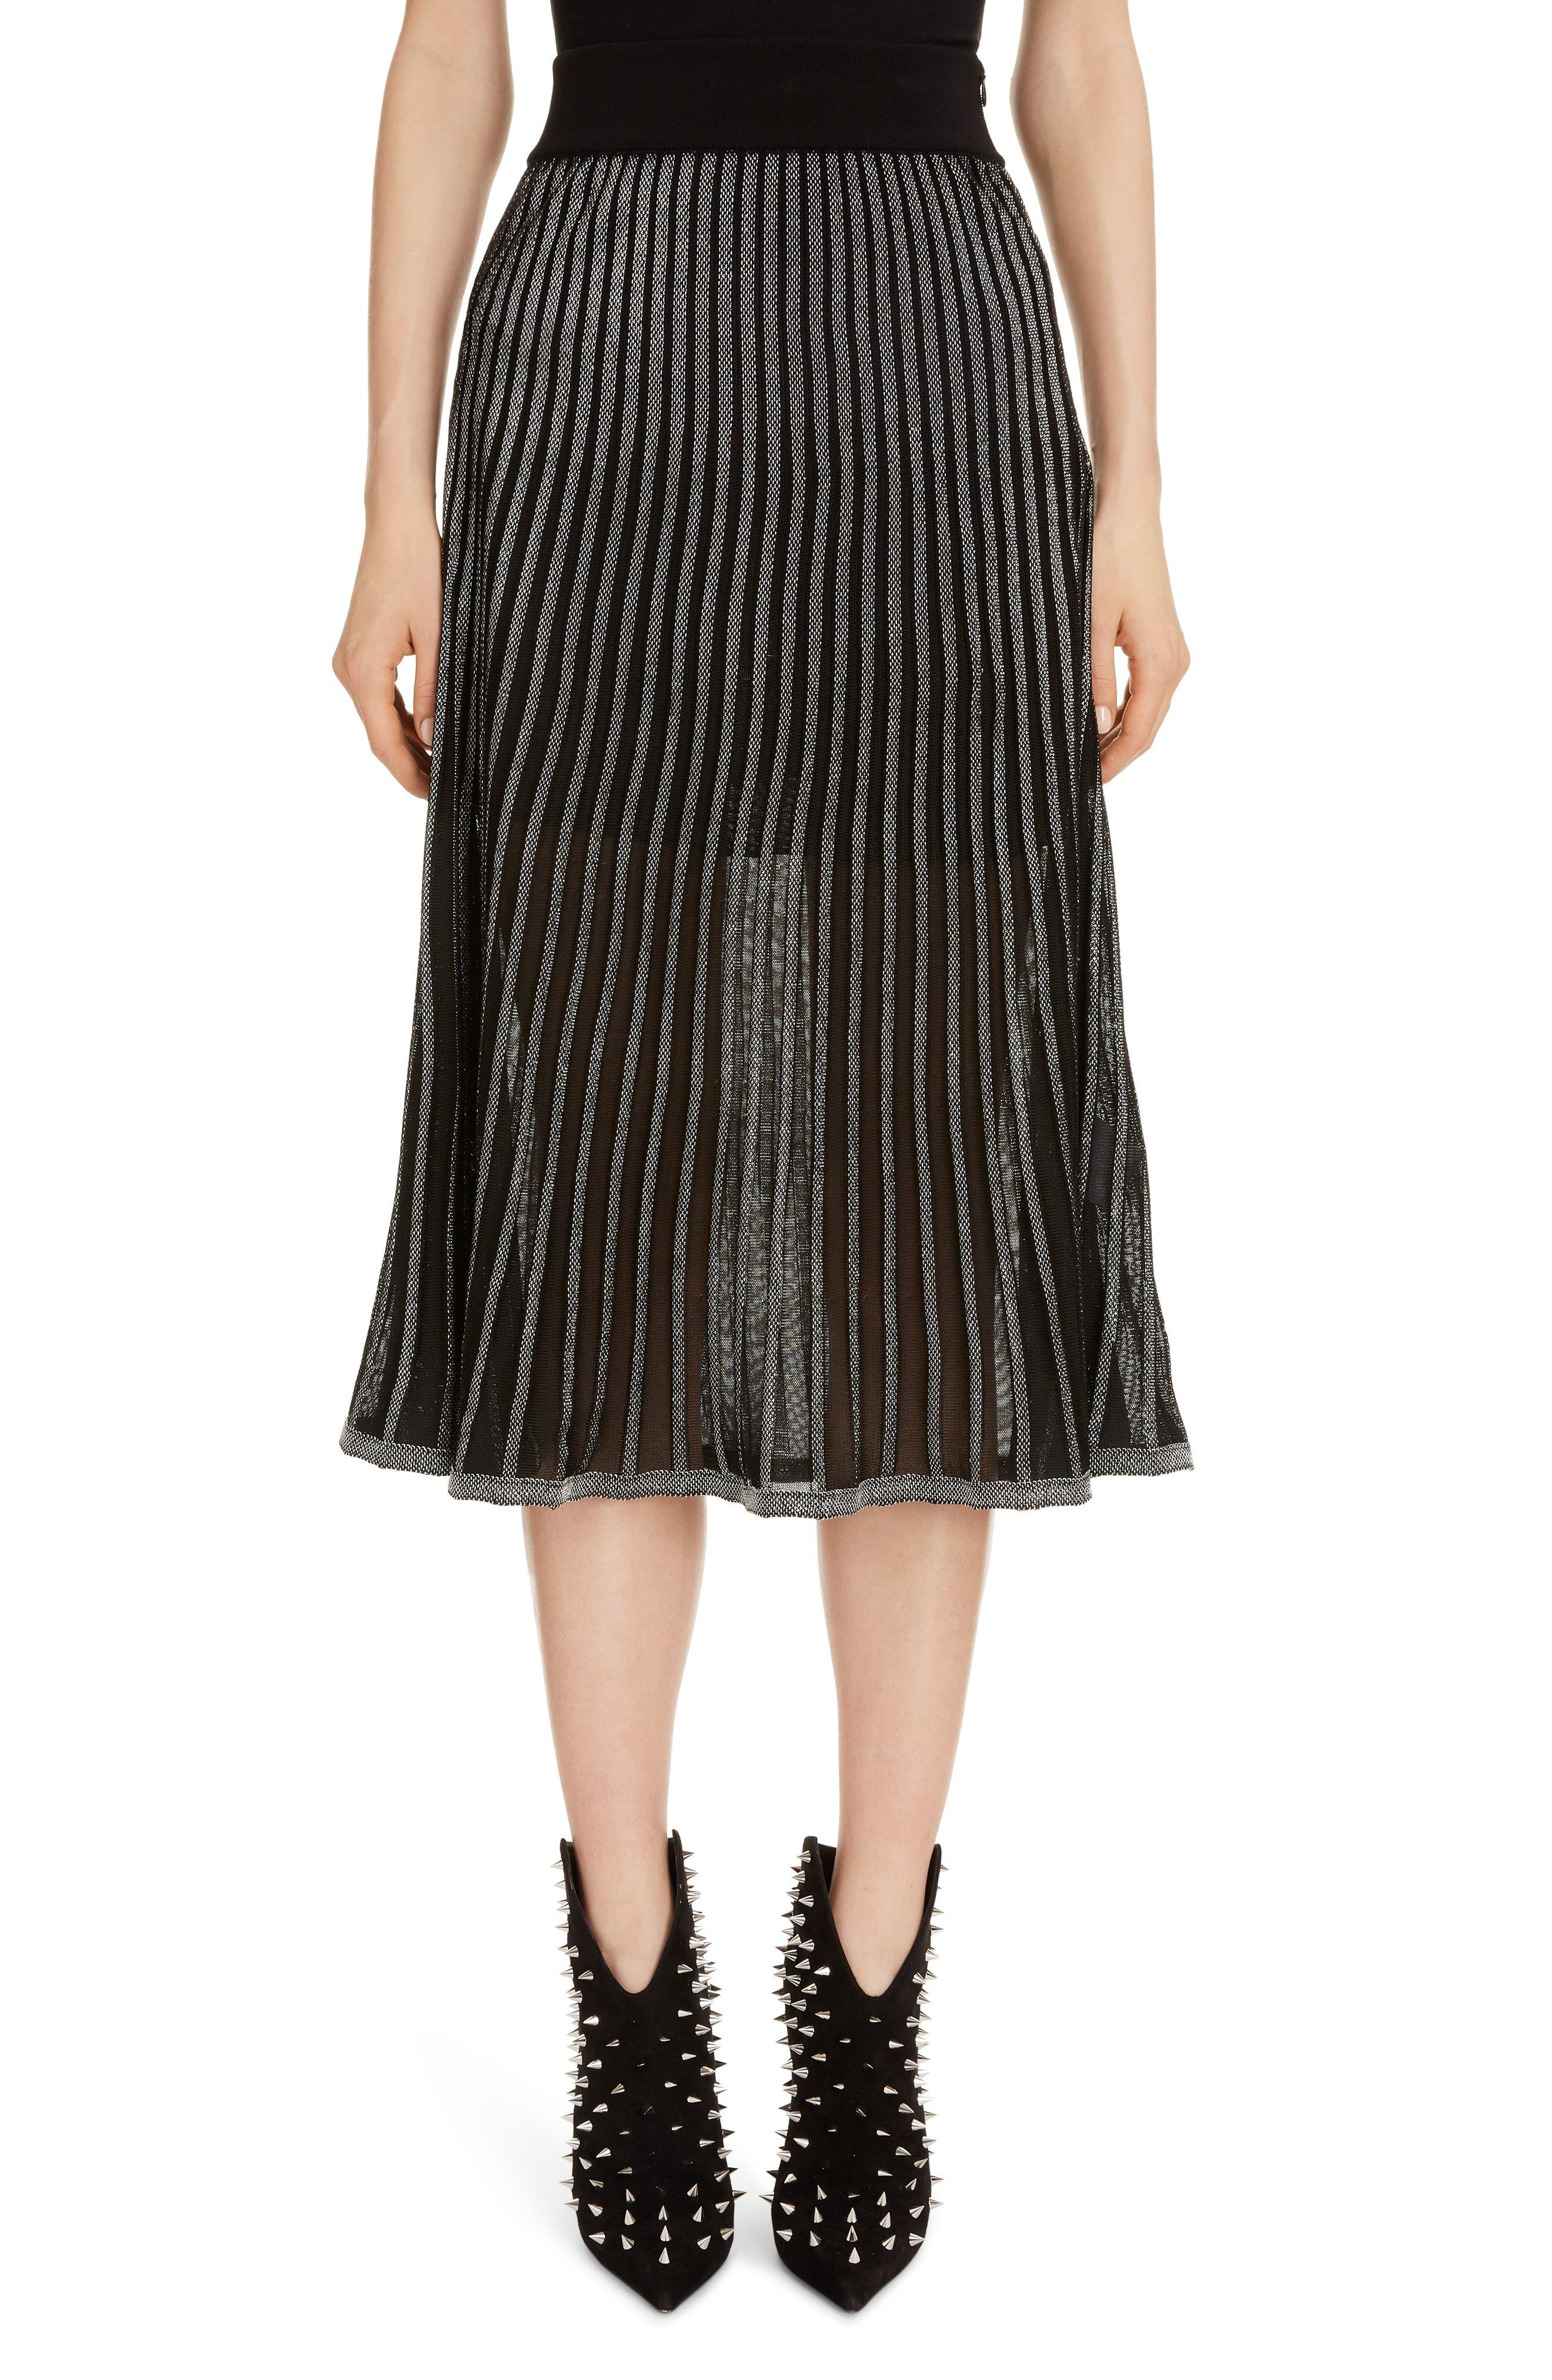 Balmain Skirts Semi Sheer Metallic Pleated Skirt